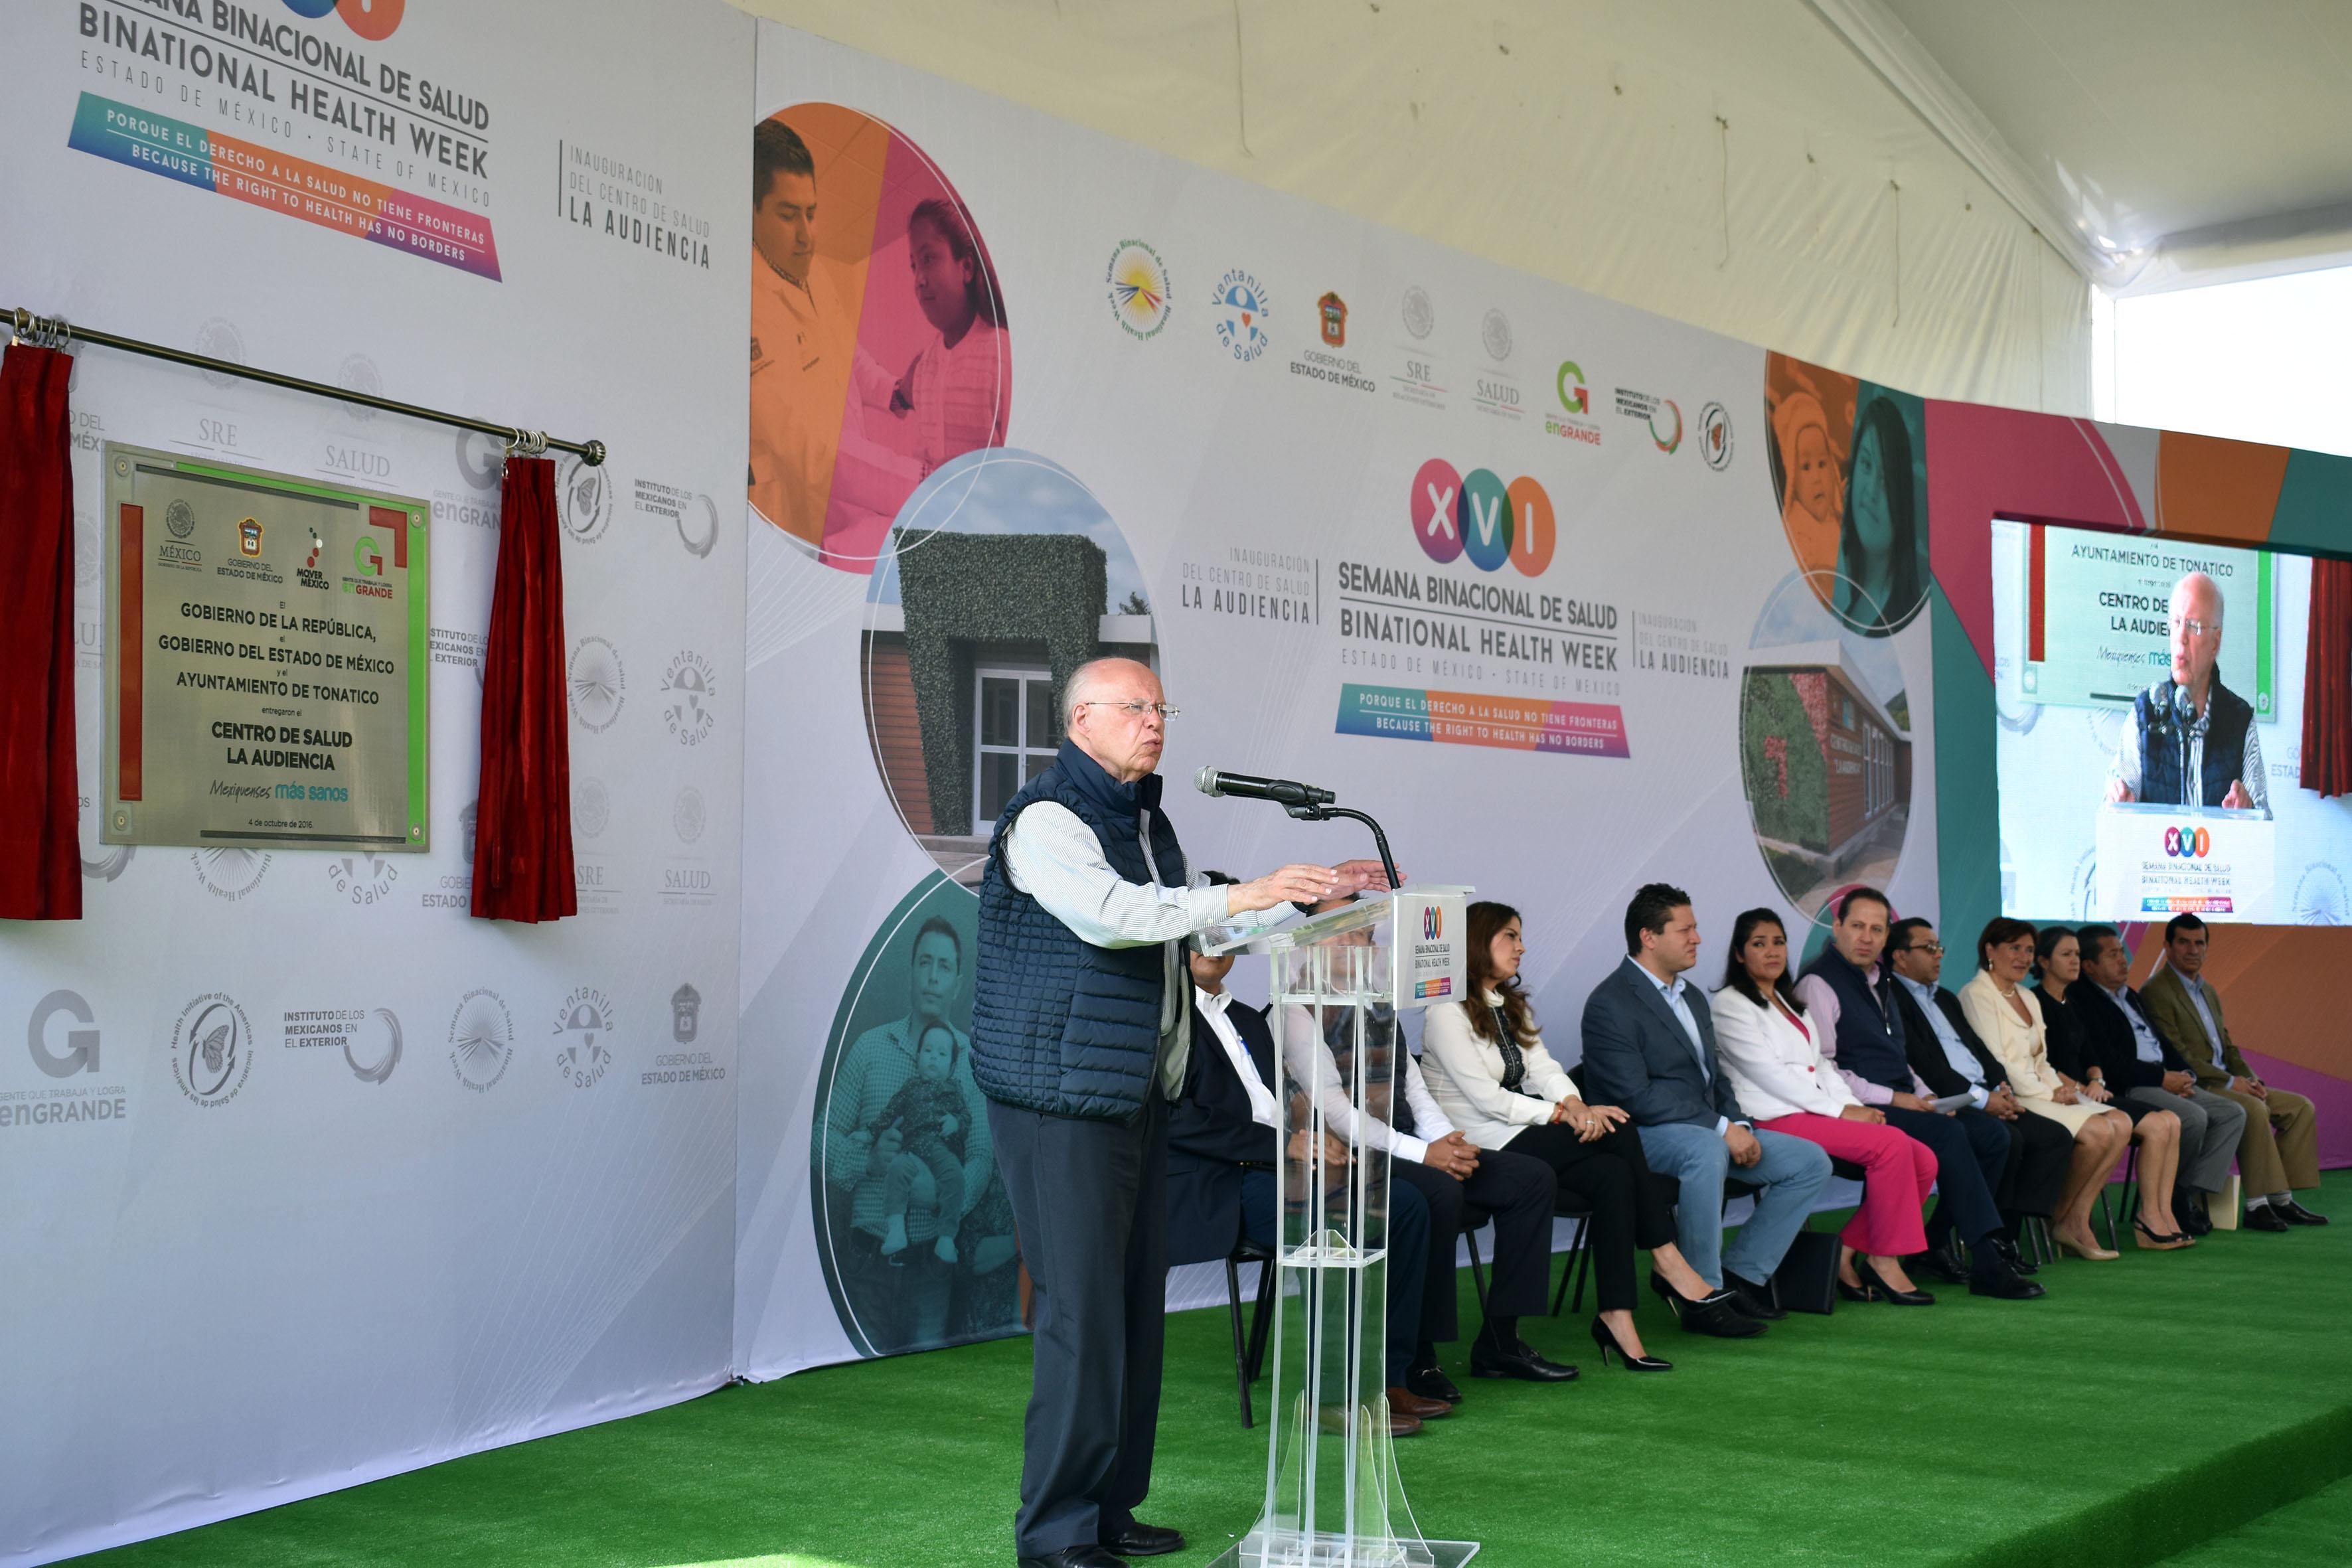 Mexico´s Minister of Health inaugurated the XVI Binational Health Week.